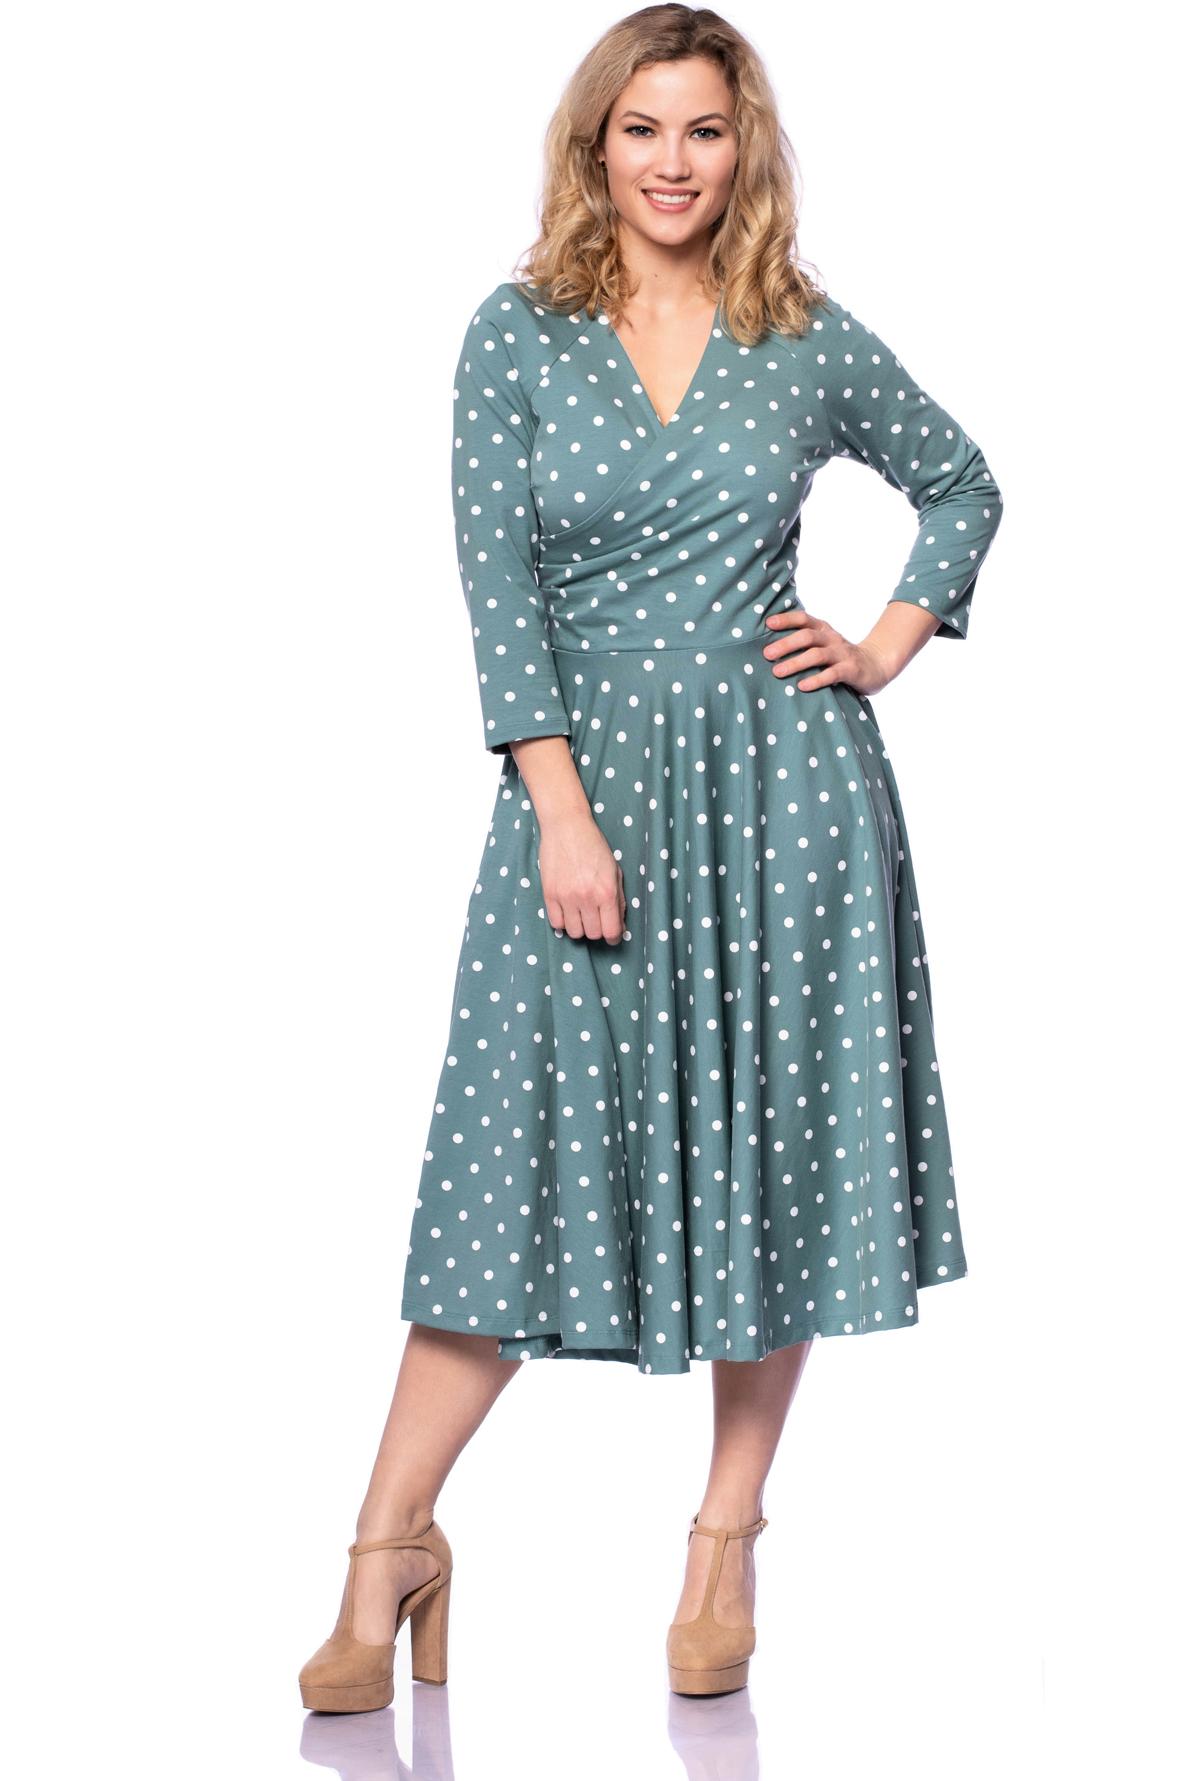 kleid,damenkleid,tellerrock,50er,bio,mode,elegant,damenmode